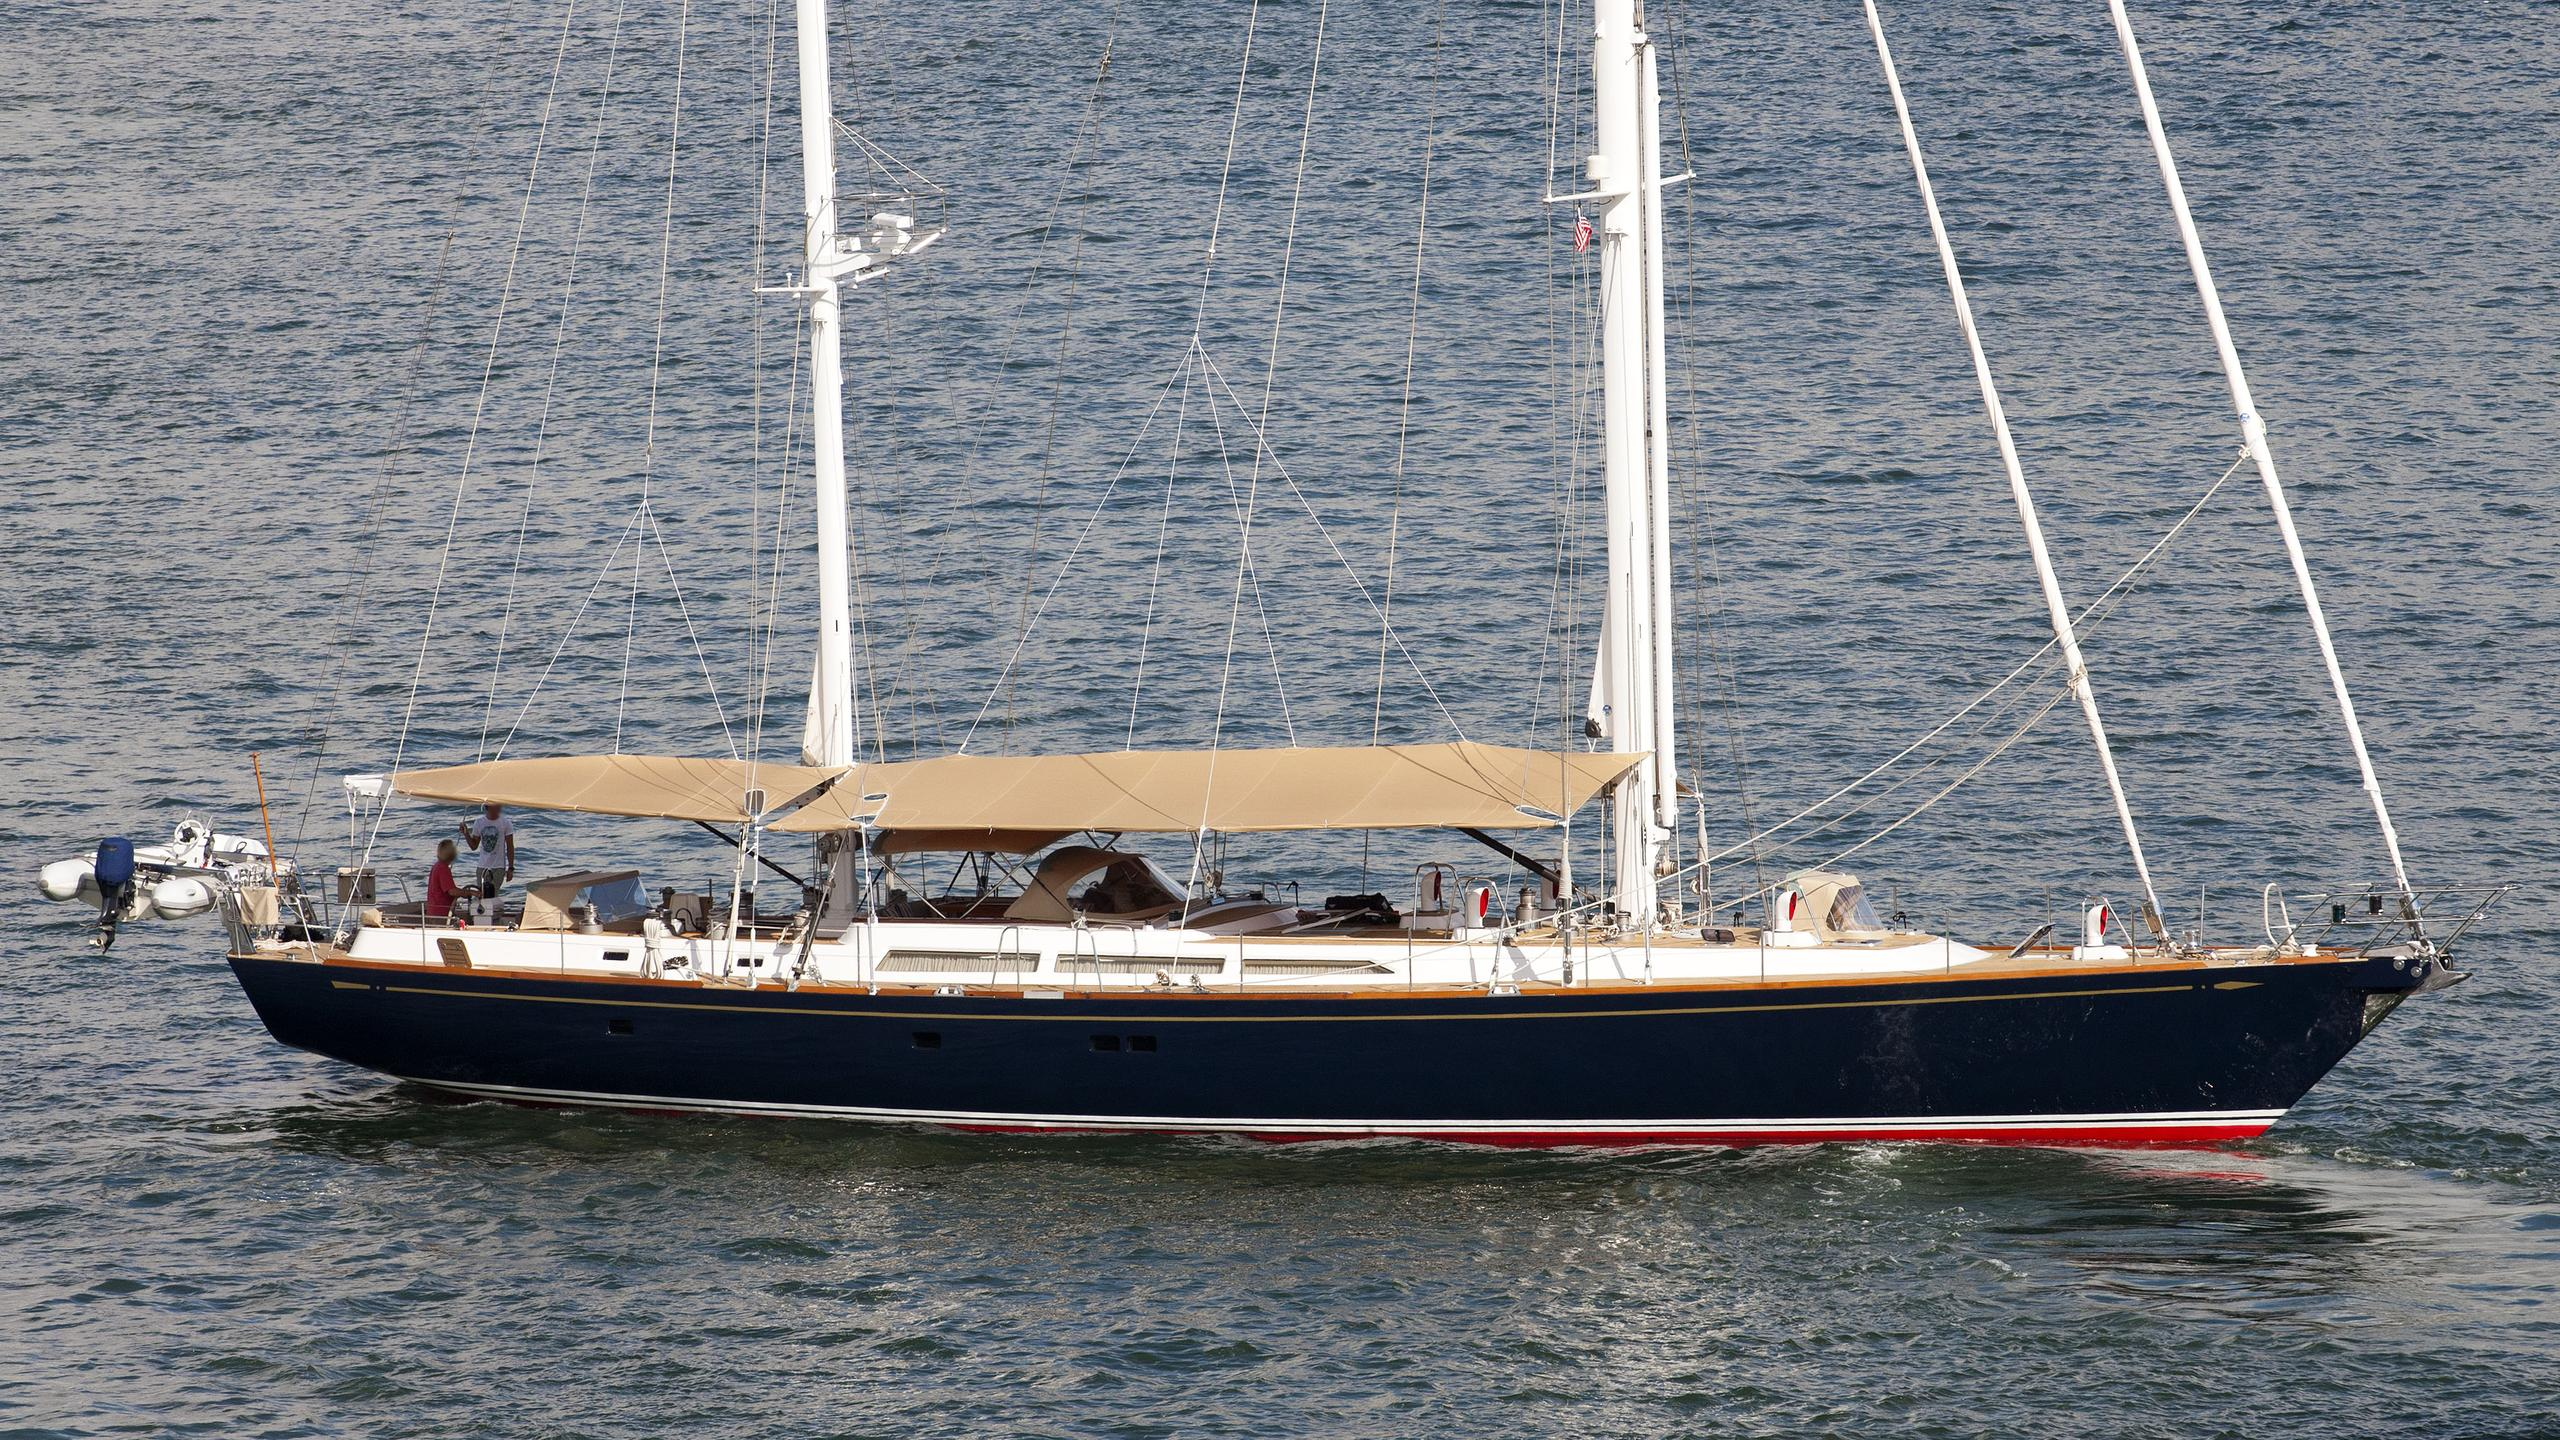 letizia-sailing-yacht-camper-nicholsons-1991-28m-profile